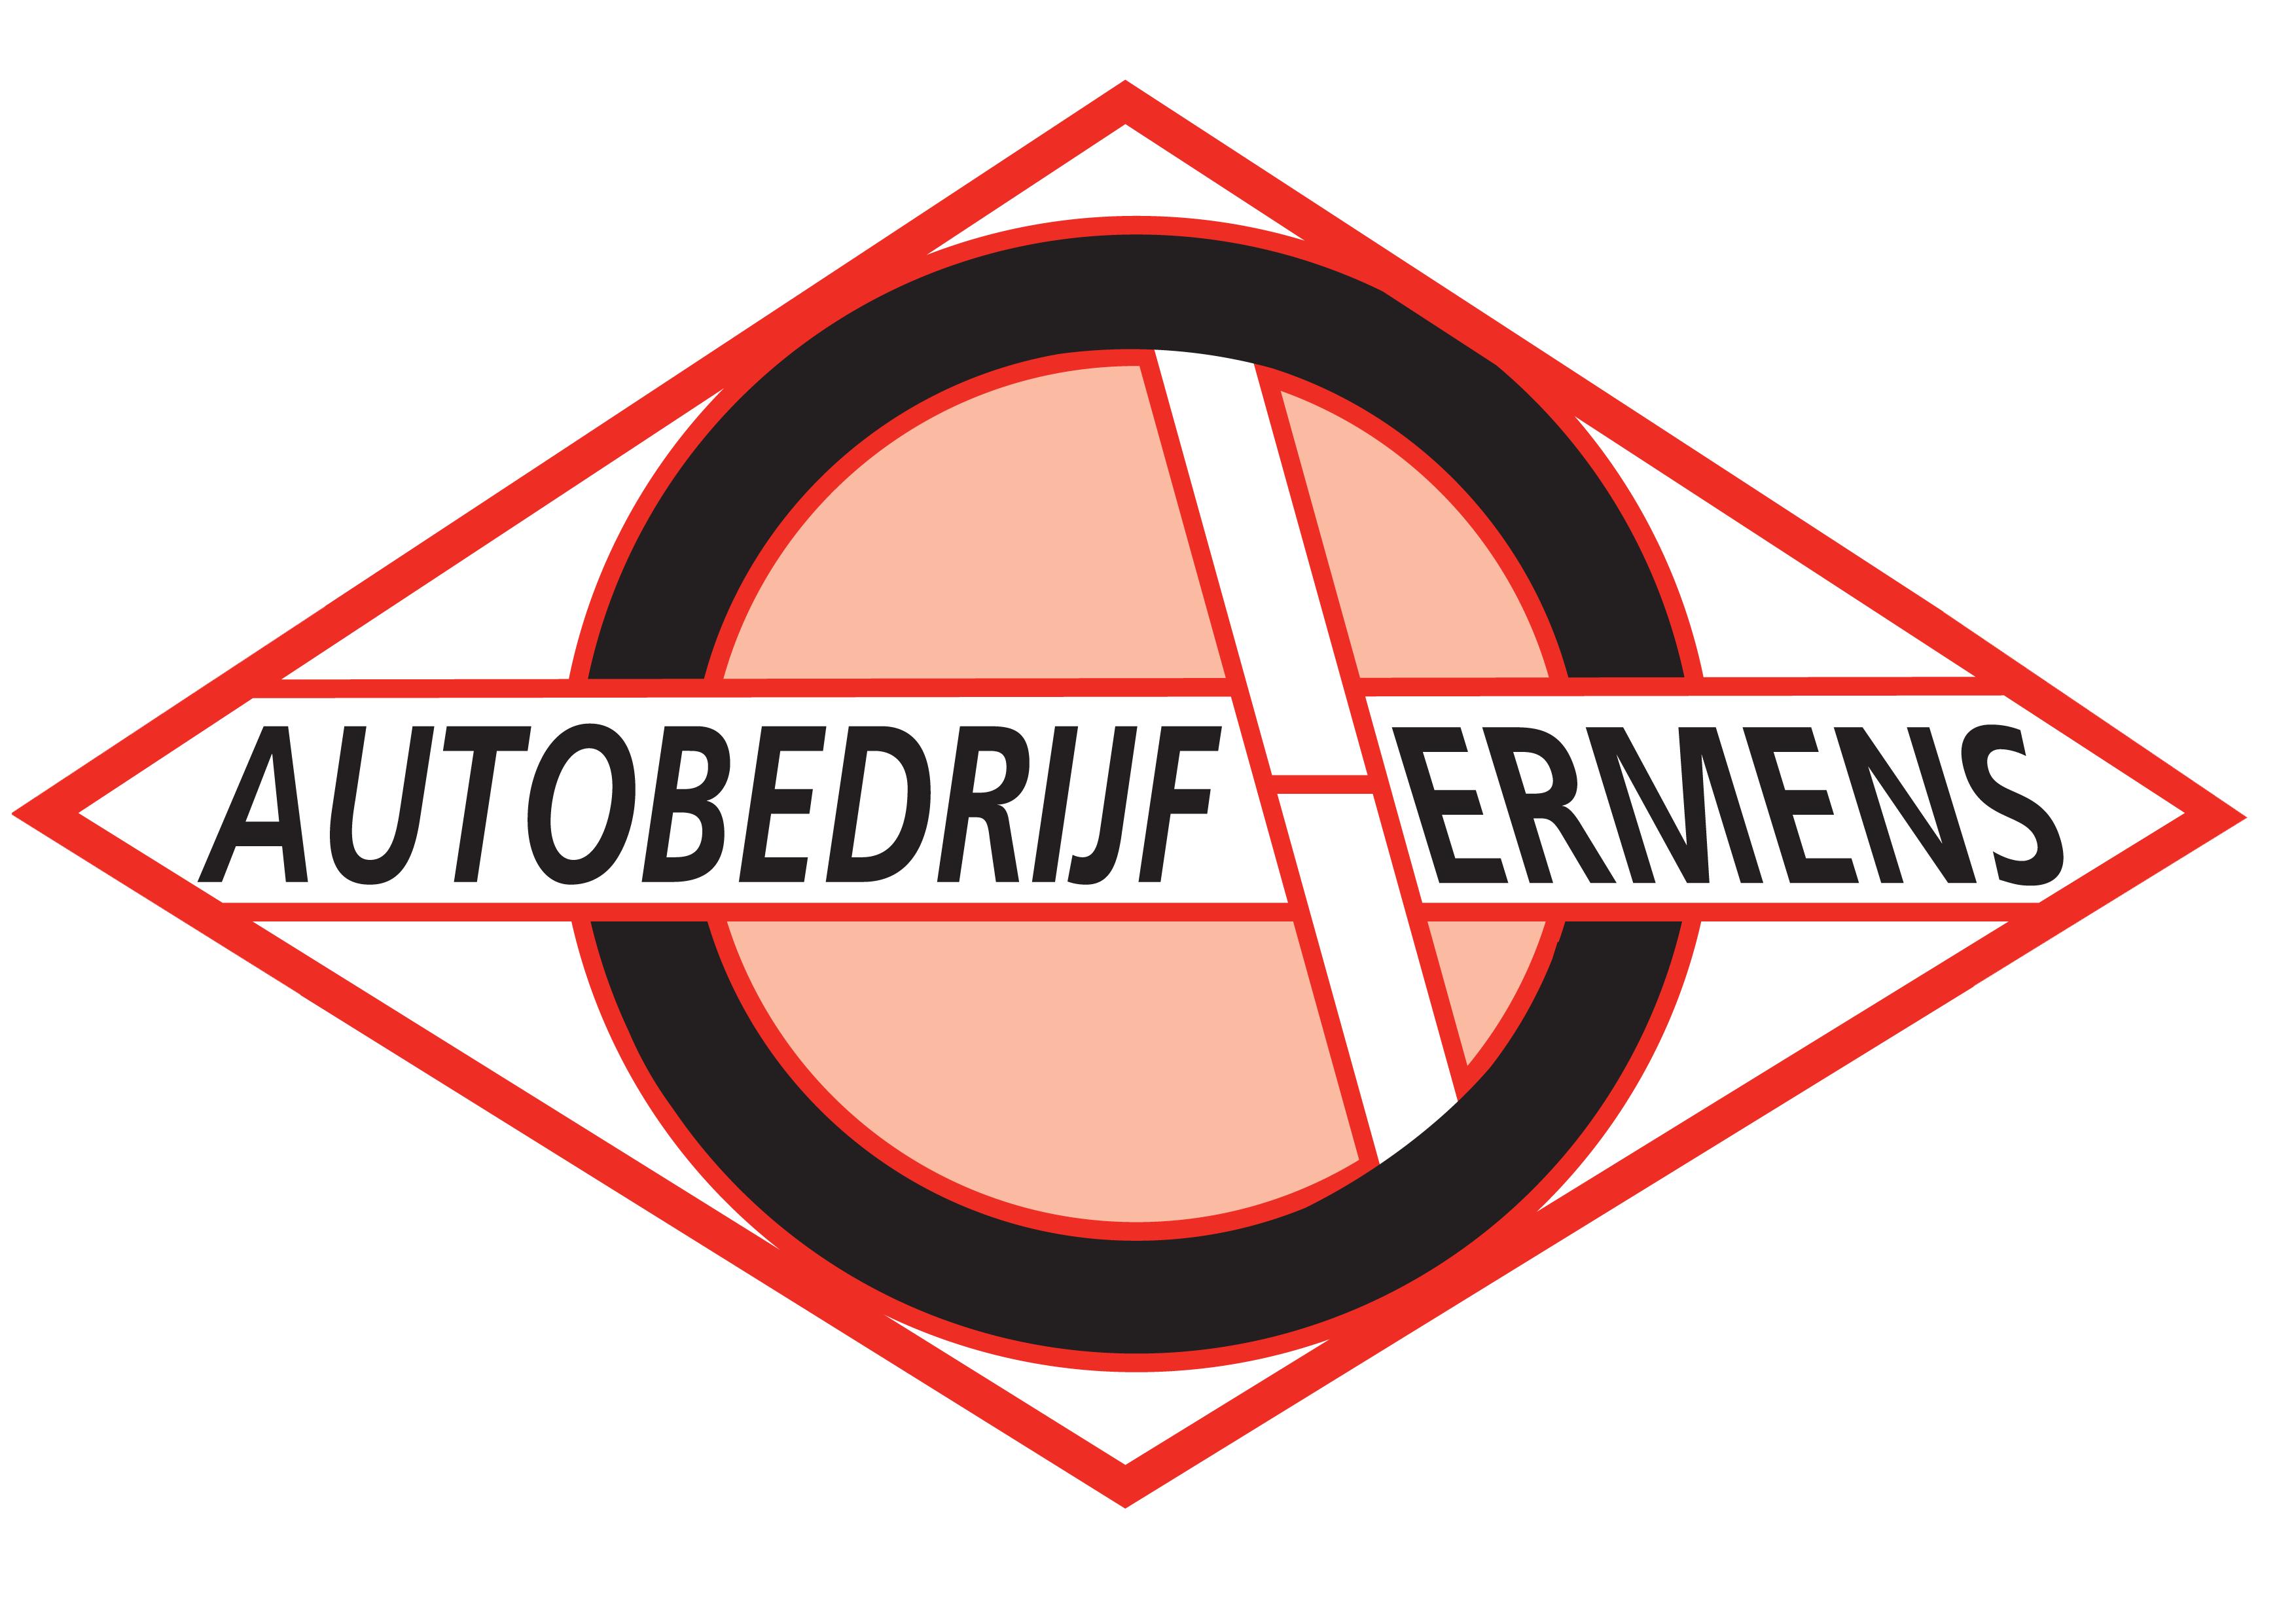 Autobedrijf Hermens